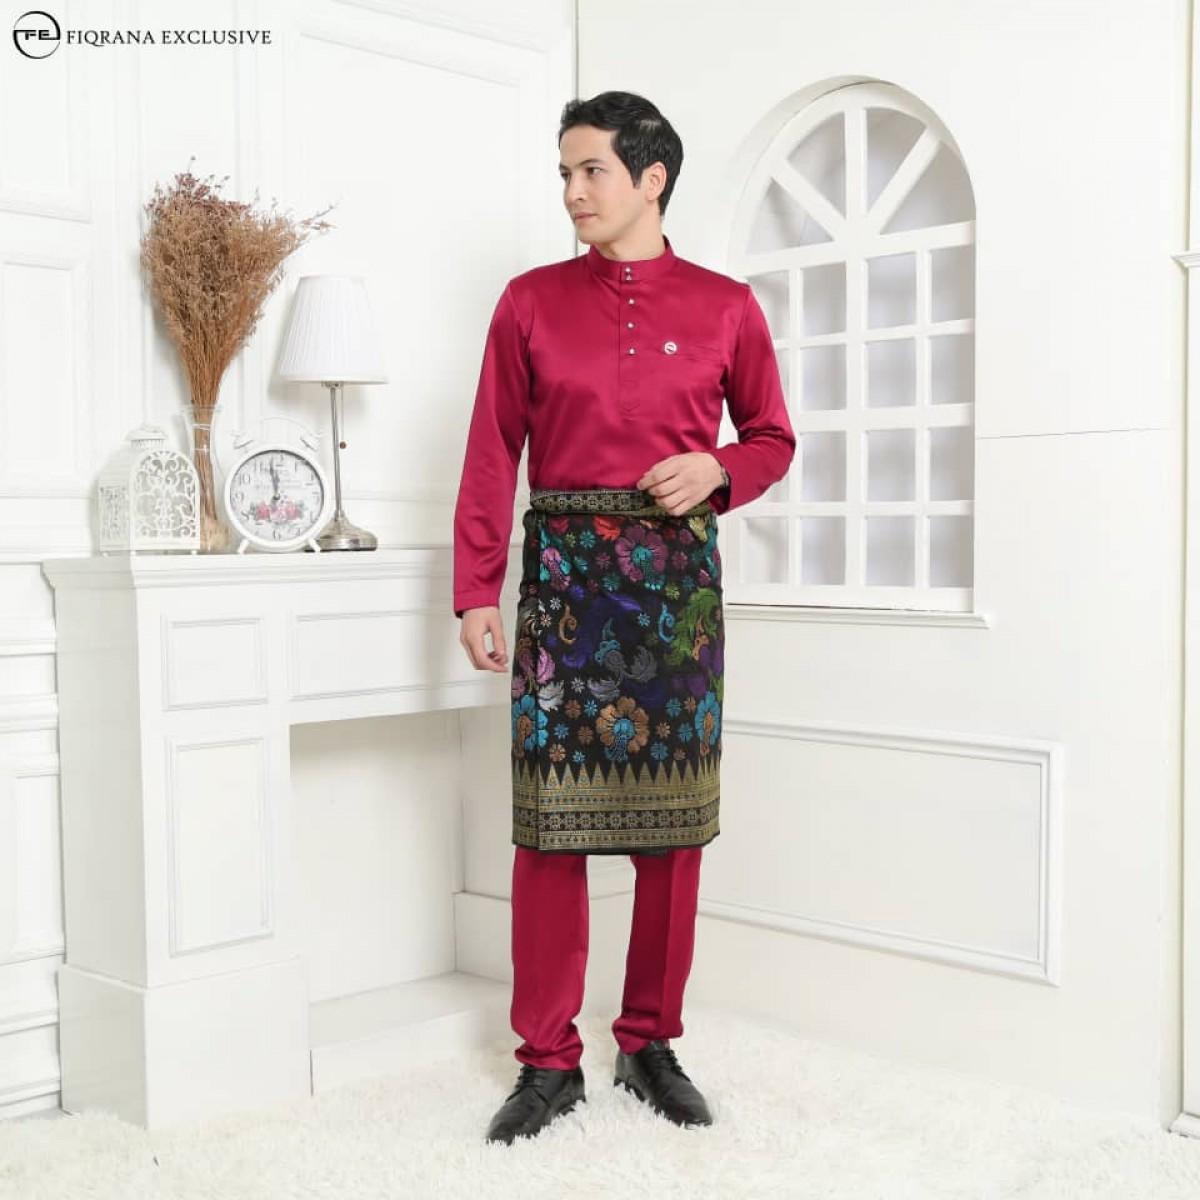 Baju Melayu Slimfit Maroon - Fiqrana Exclusive